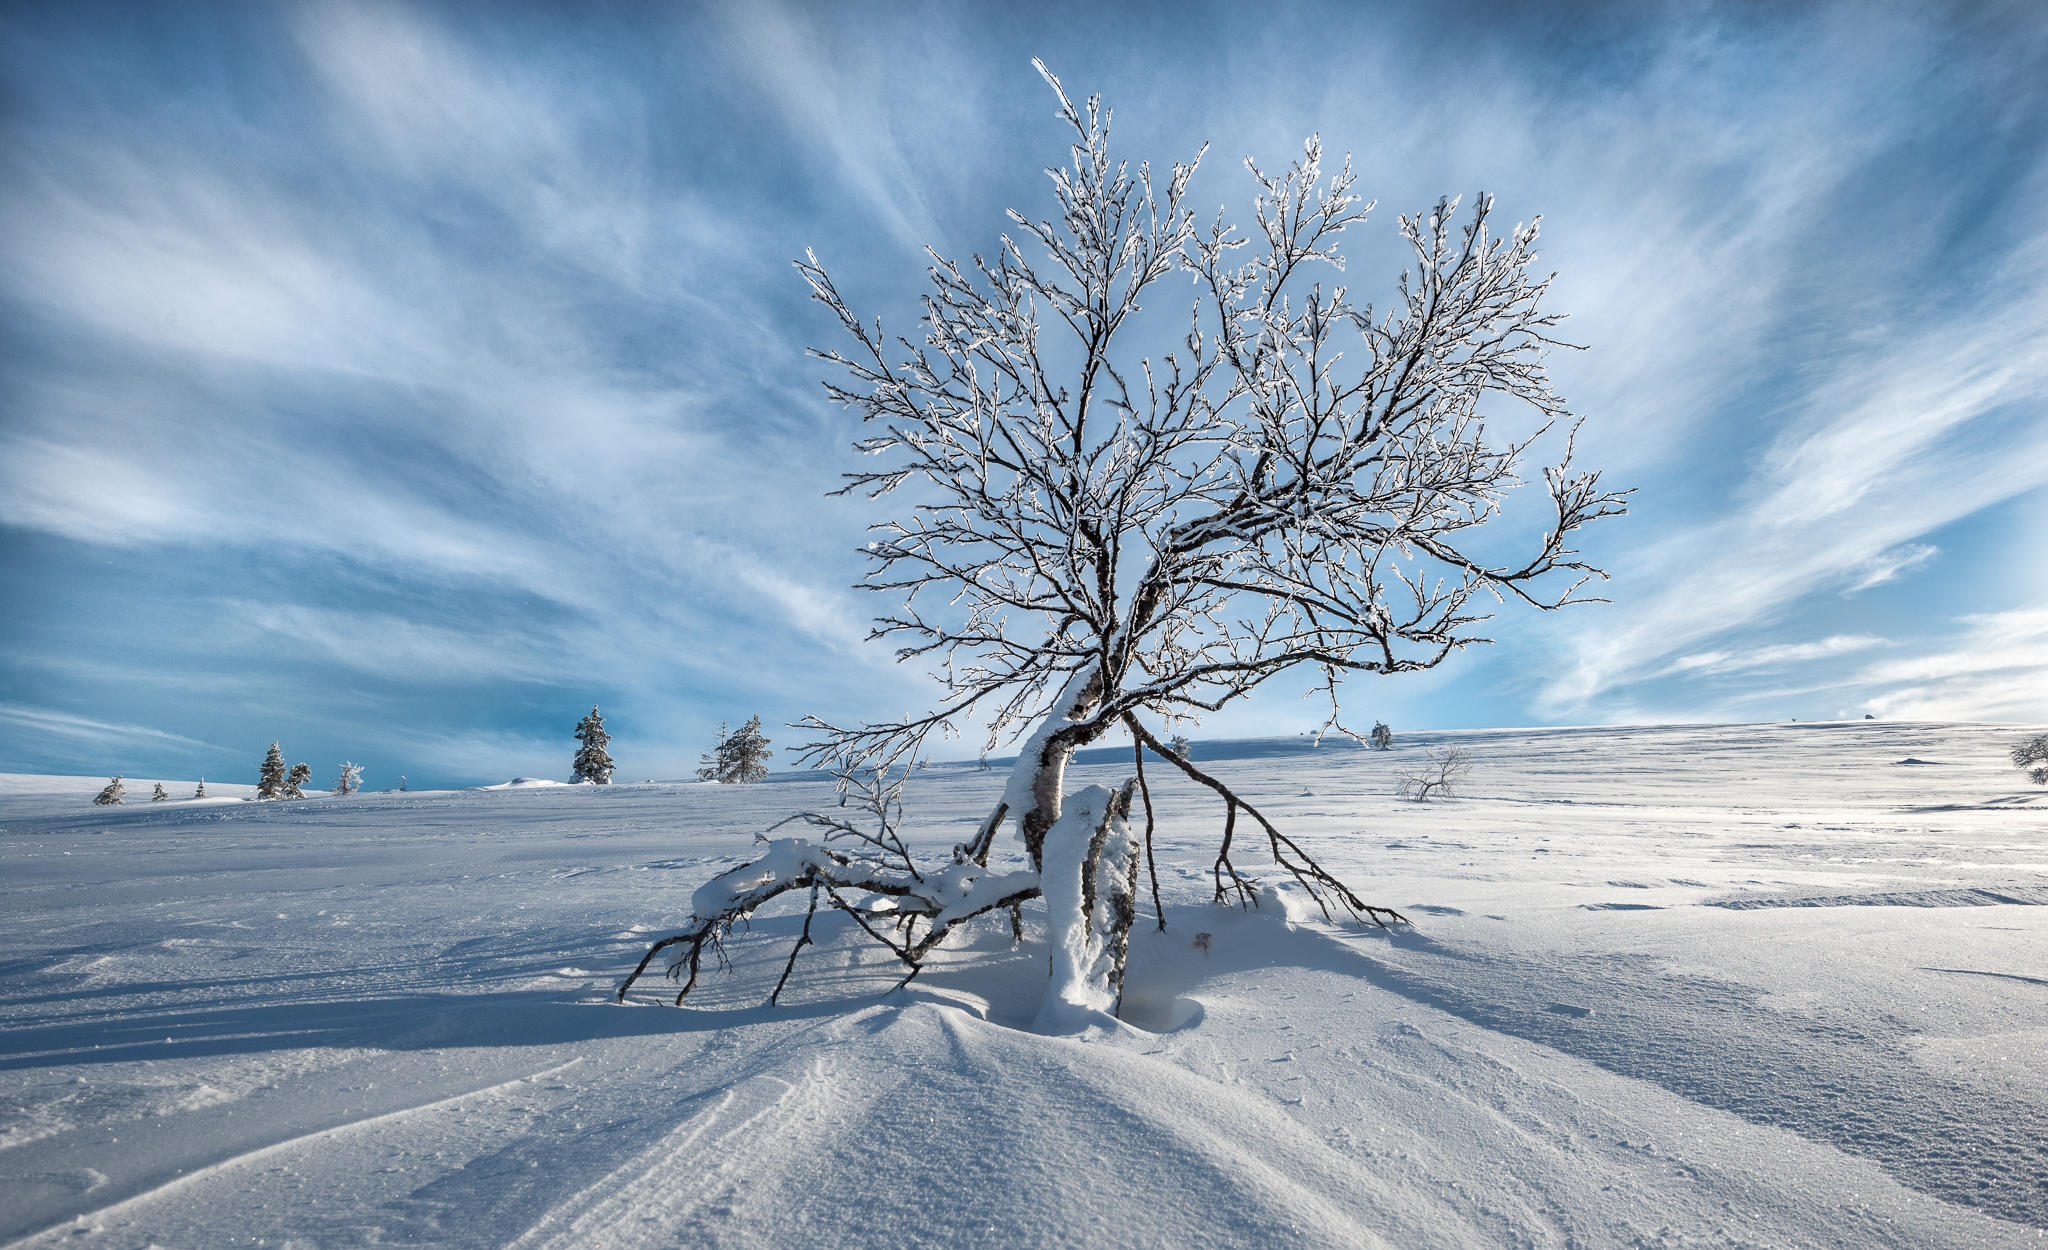 обои зима, поле, сугробы, снег картинки фото